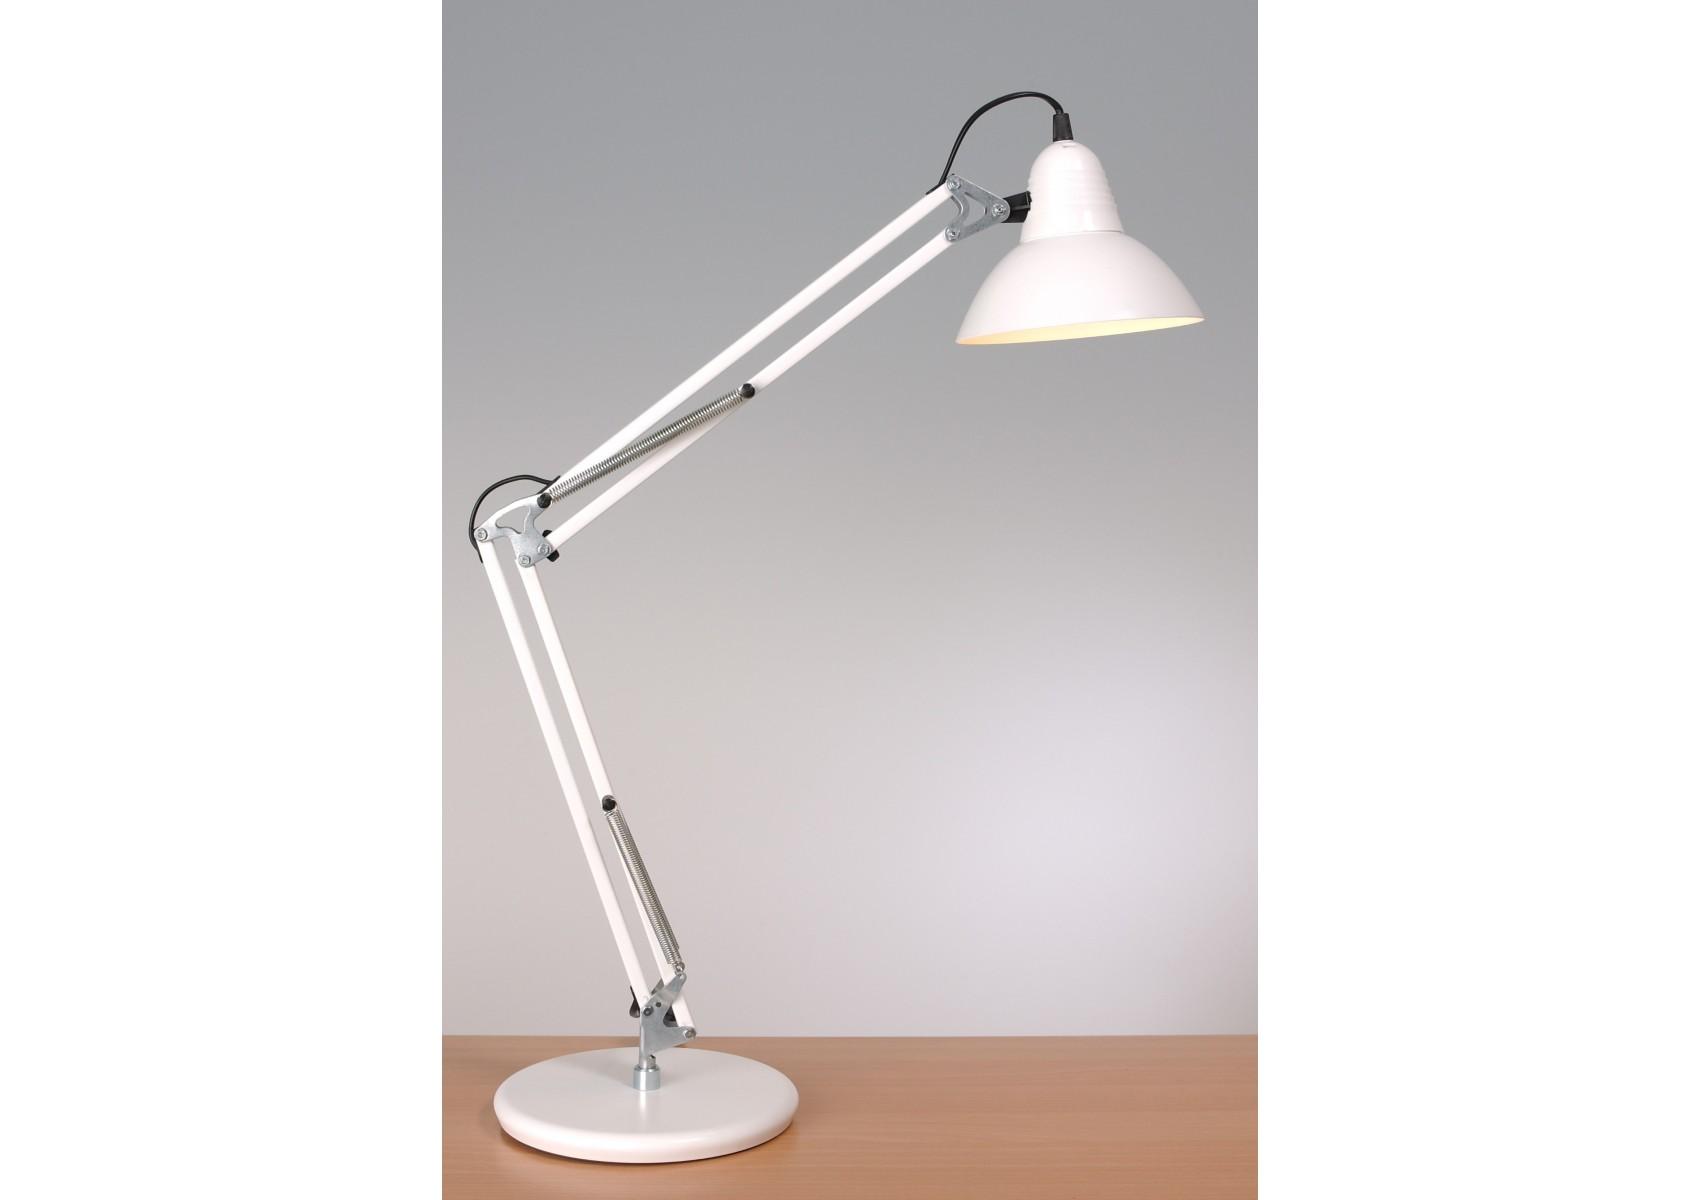 grande lampe poser articul e architecte ld95 aluminor. Black Bedroom Furniture Sets. Home Design Ideas